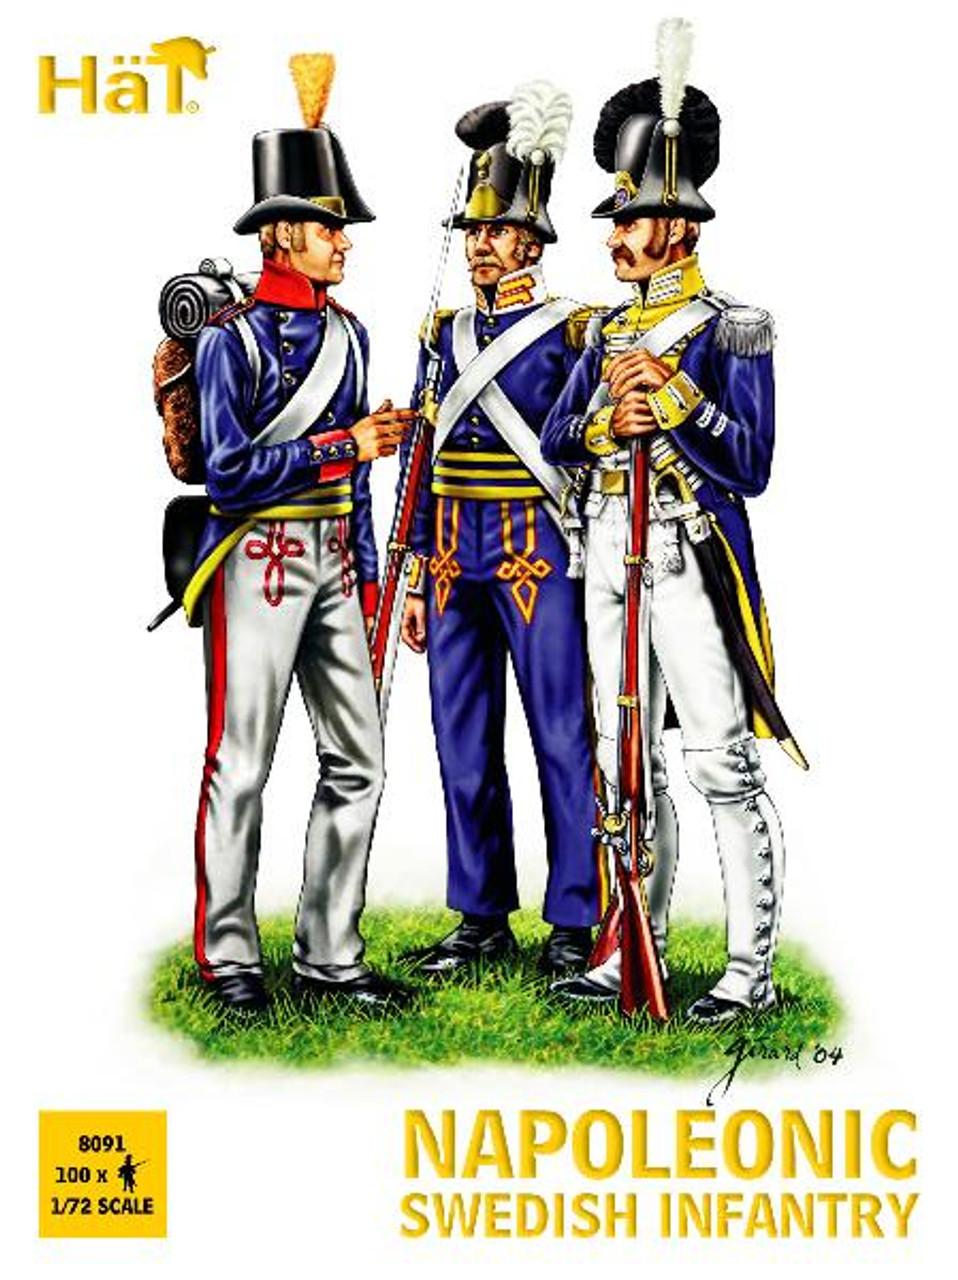 HaT 8091 Napoleonic Swedish Infantry Figures 1:72 Scale